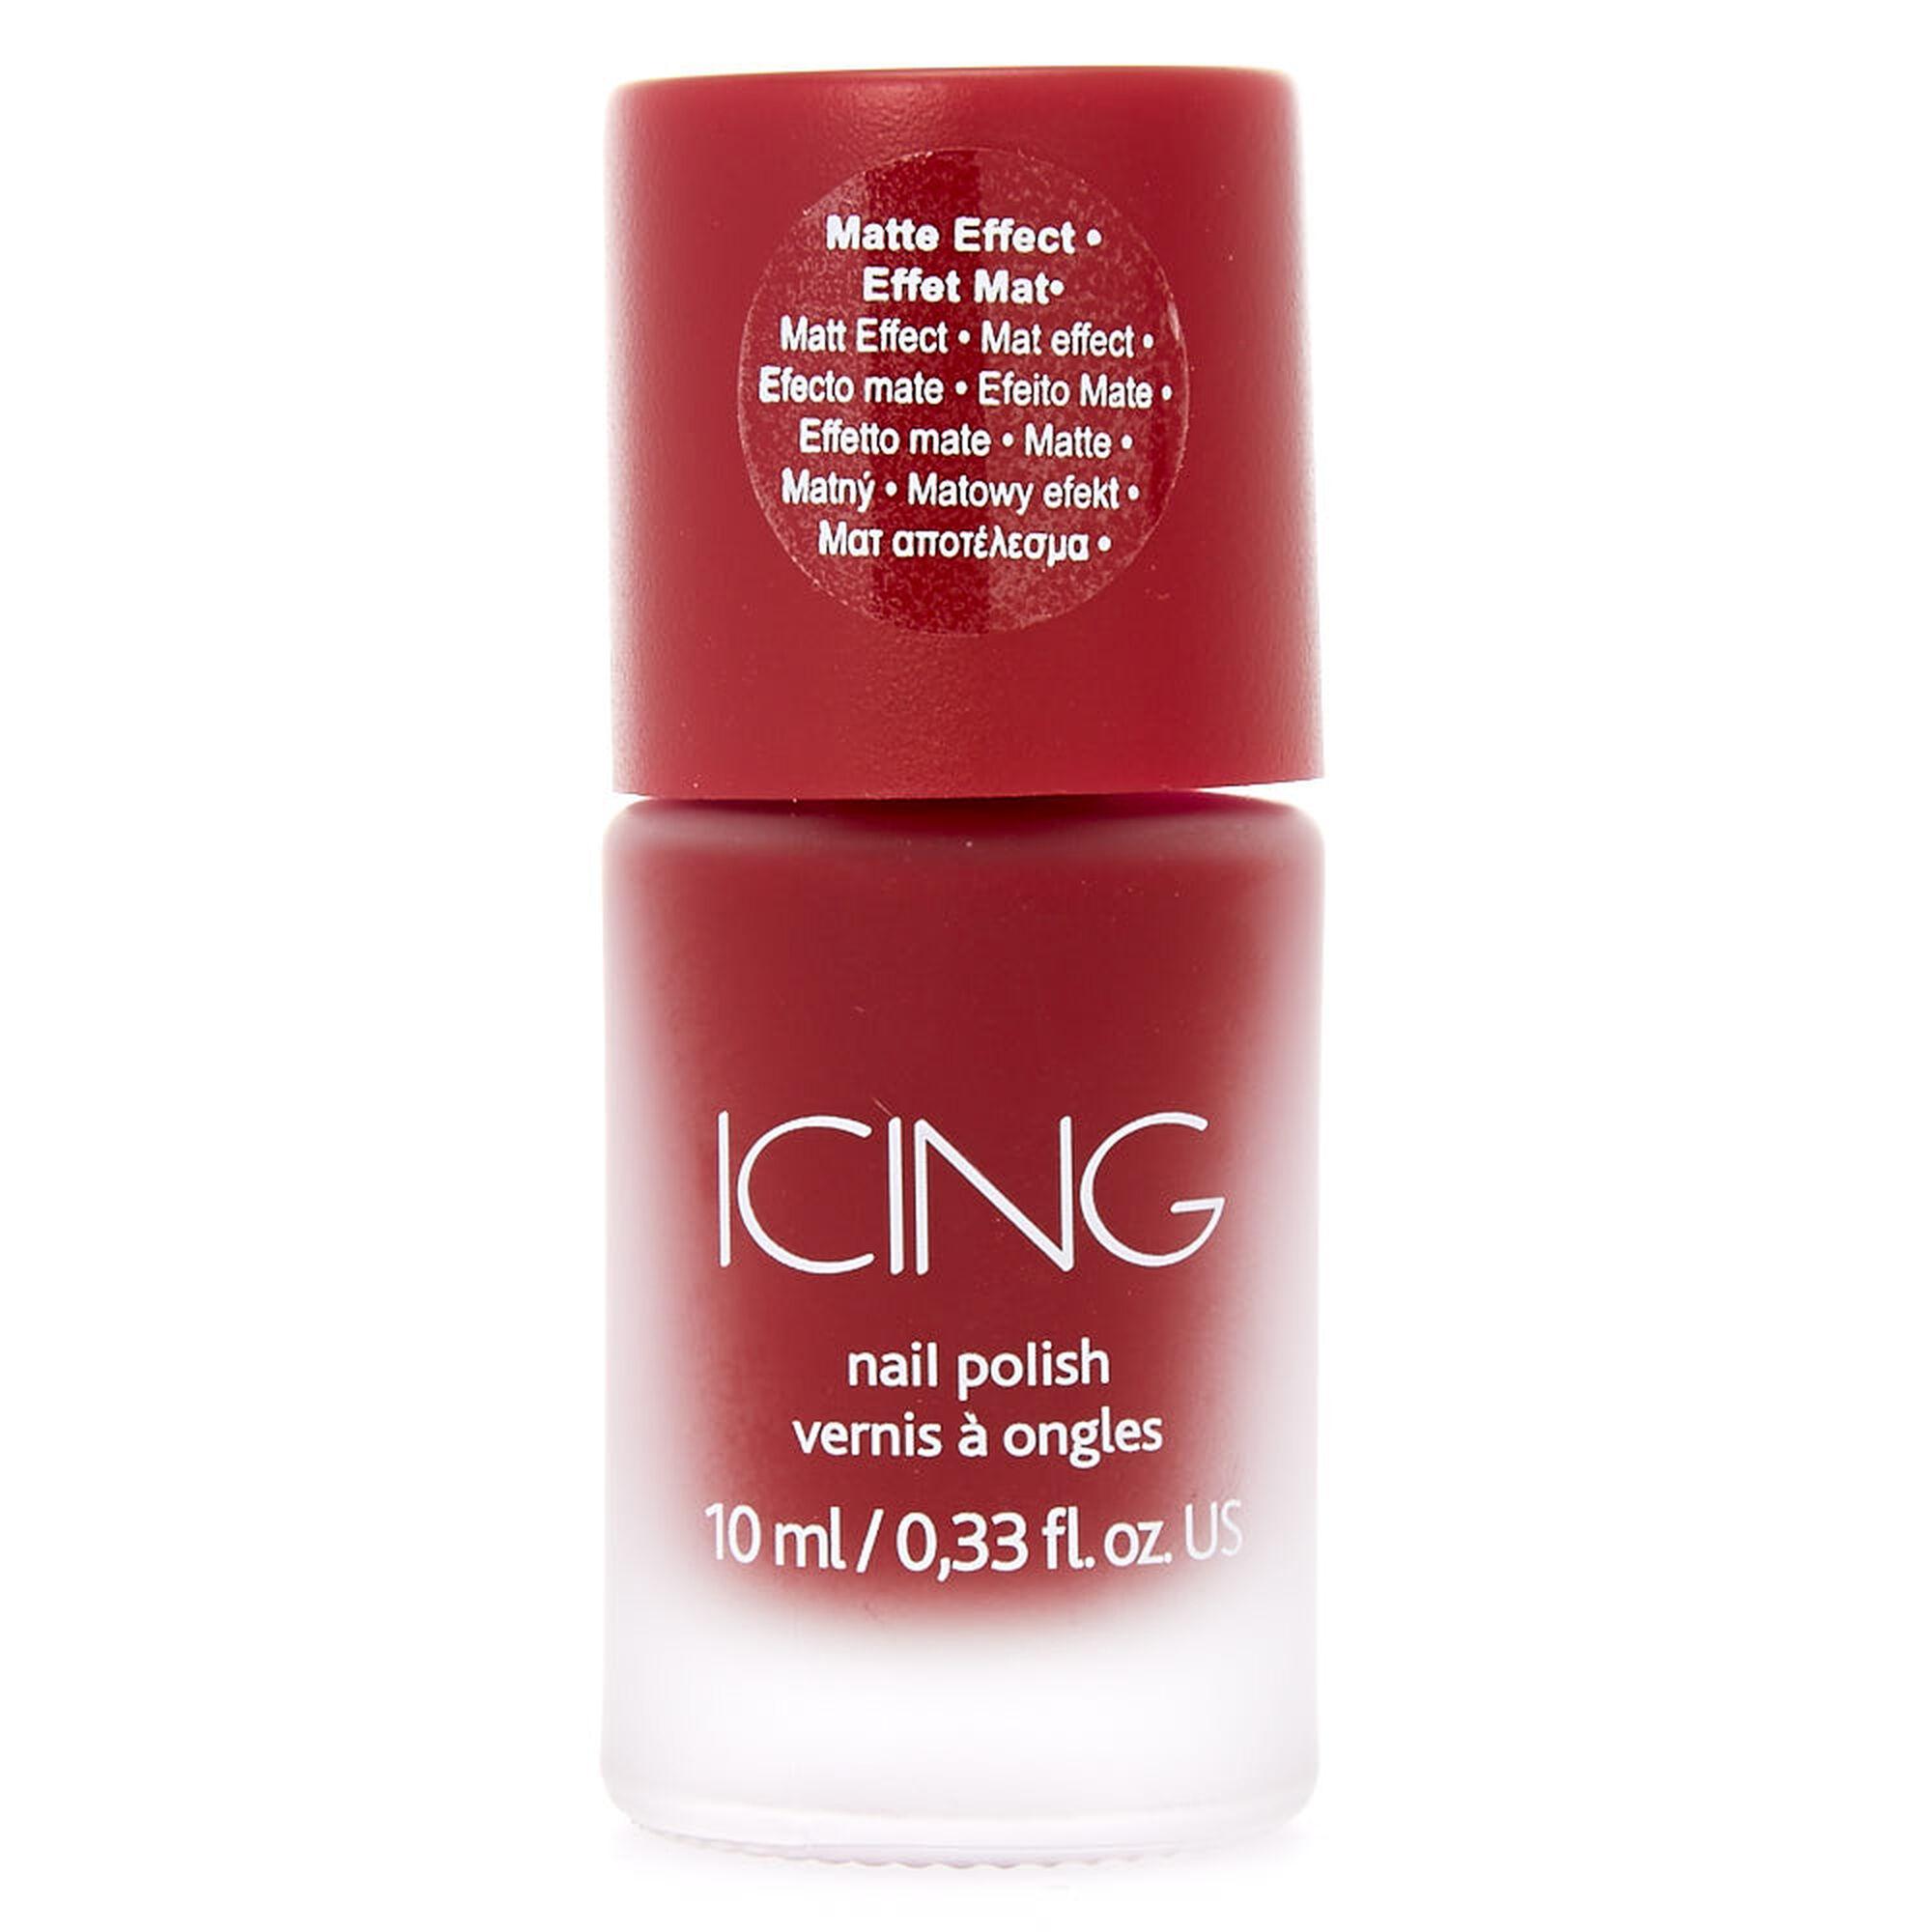 Dark Red Matte Nail Polish | Icing US